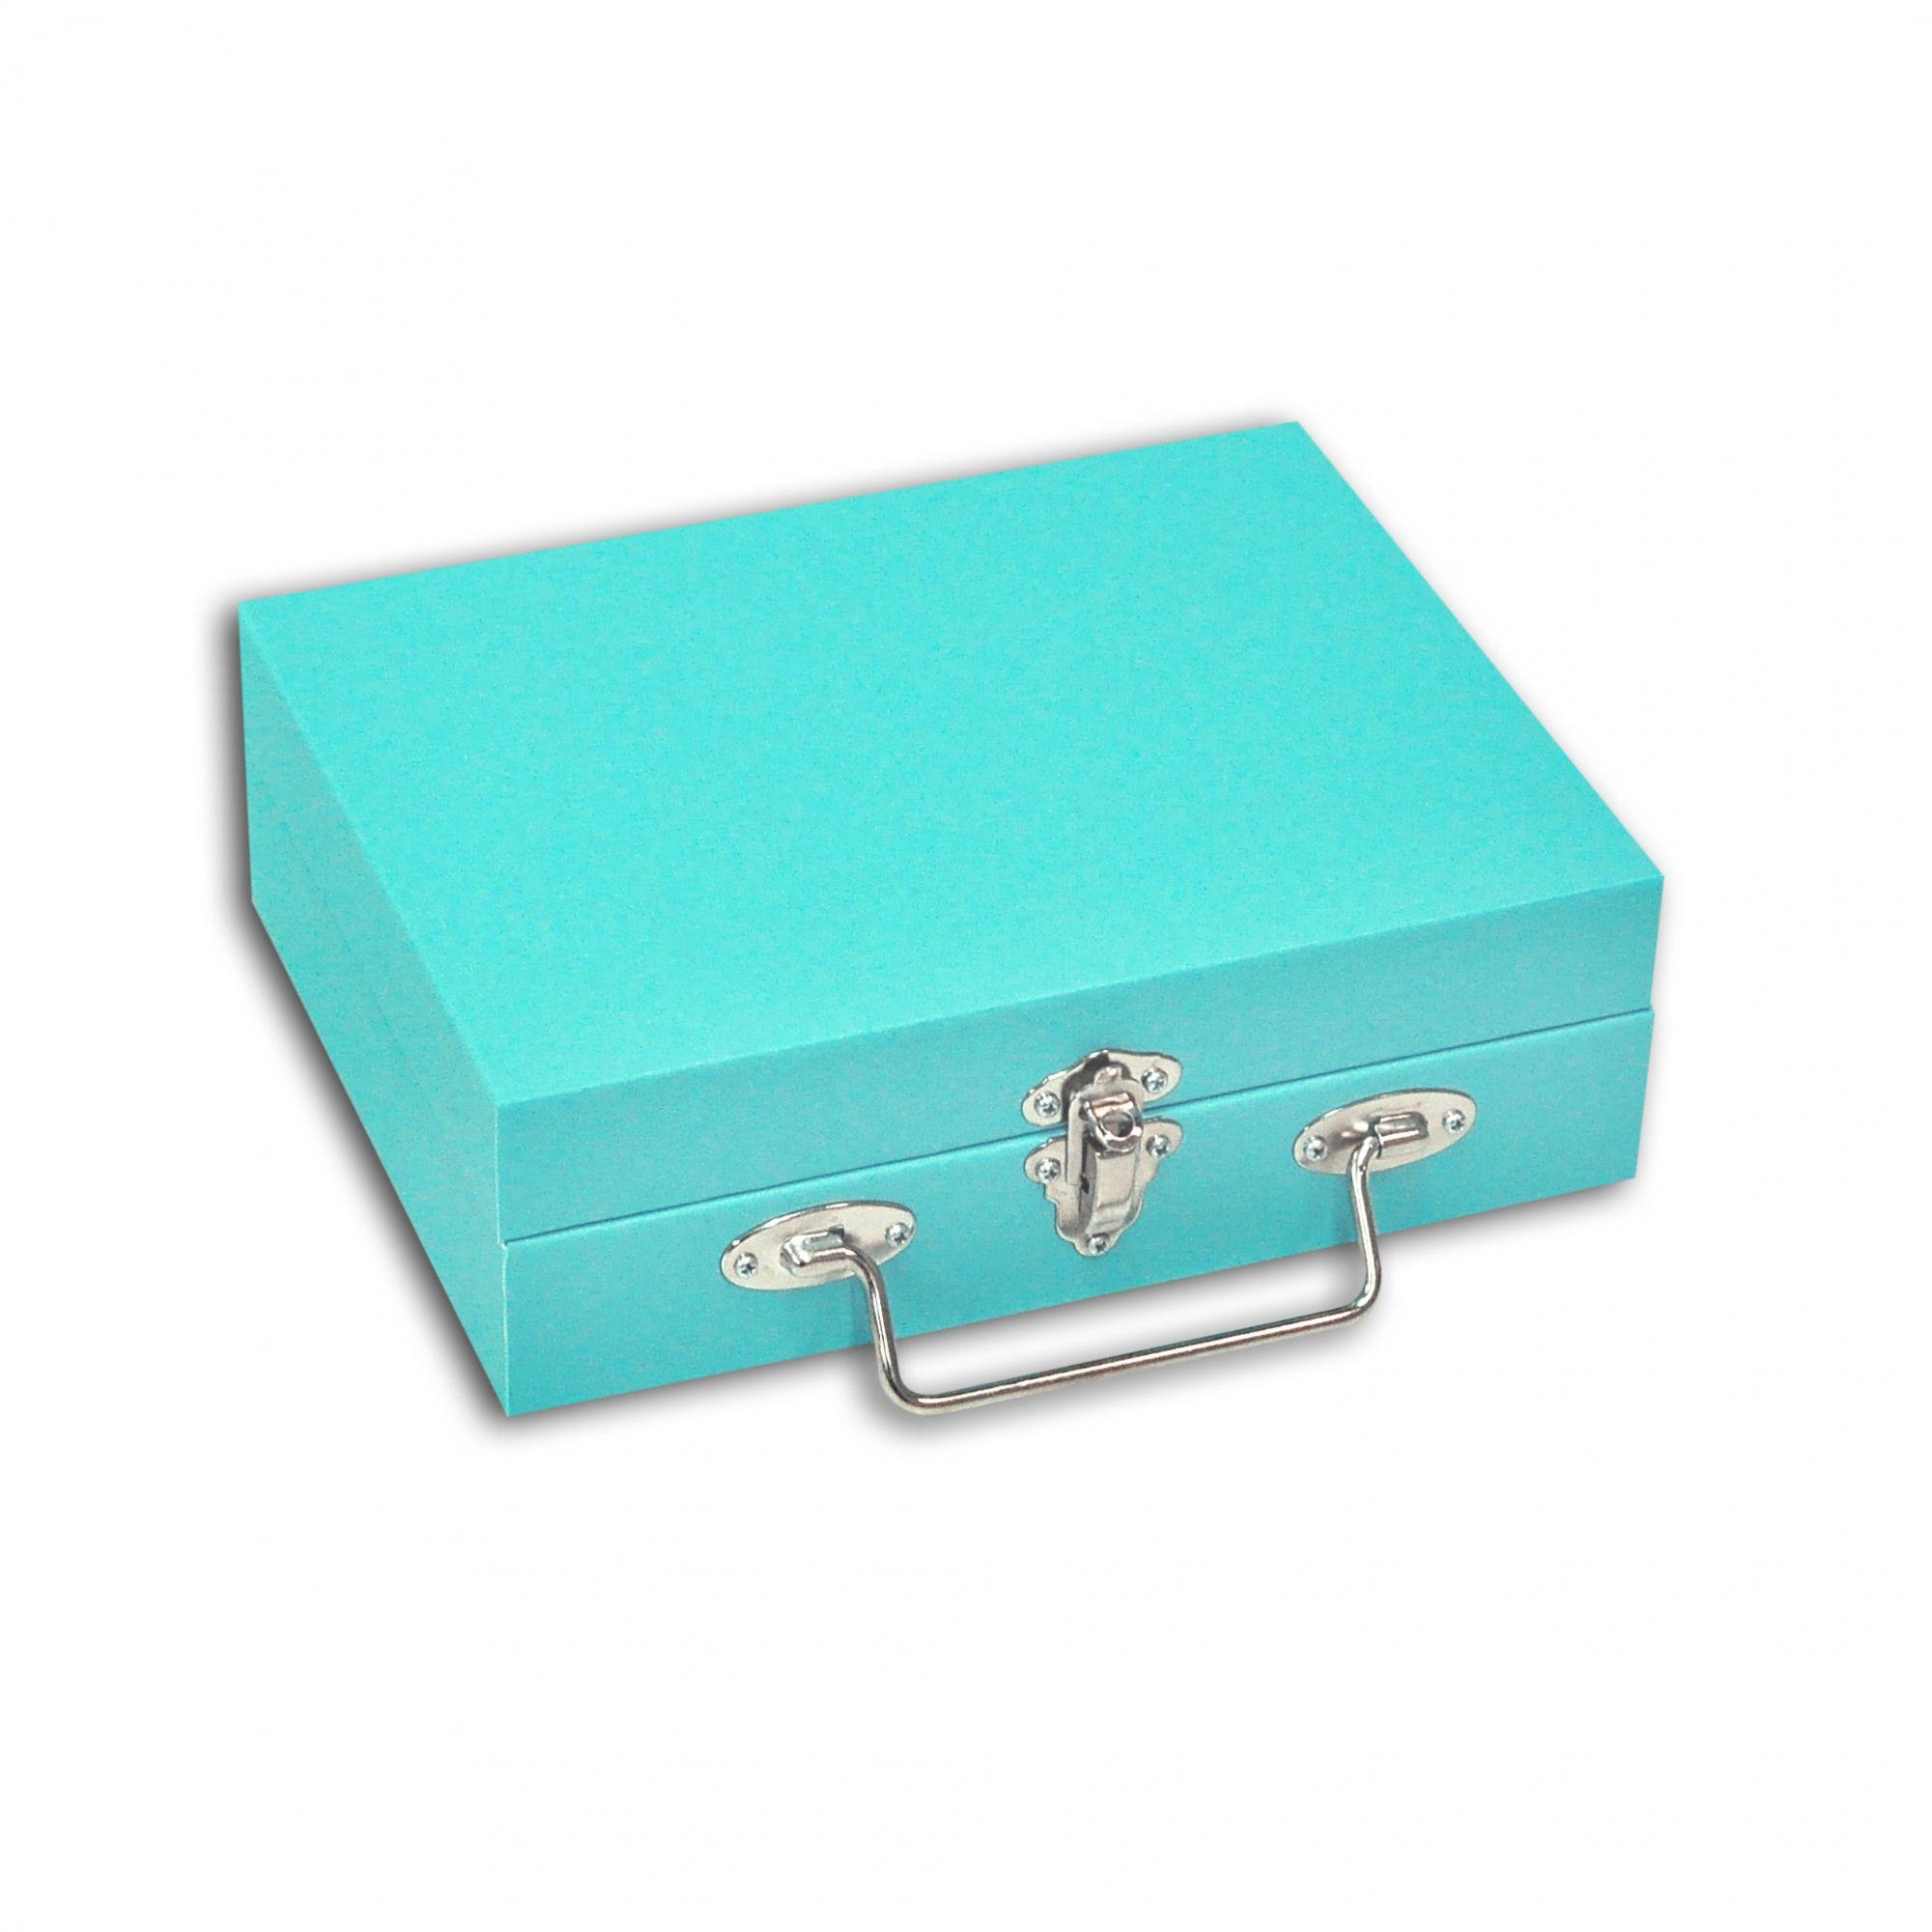 Maleta / Porta-Joias Pequeno - Tiffany Blue / Cinza